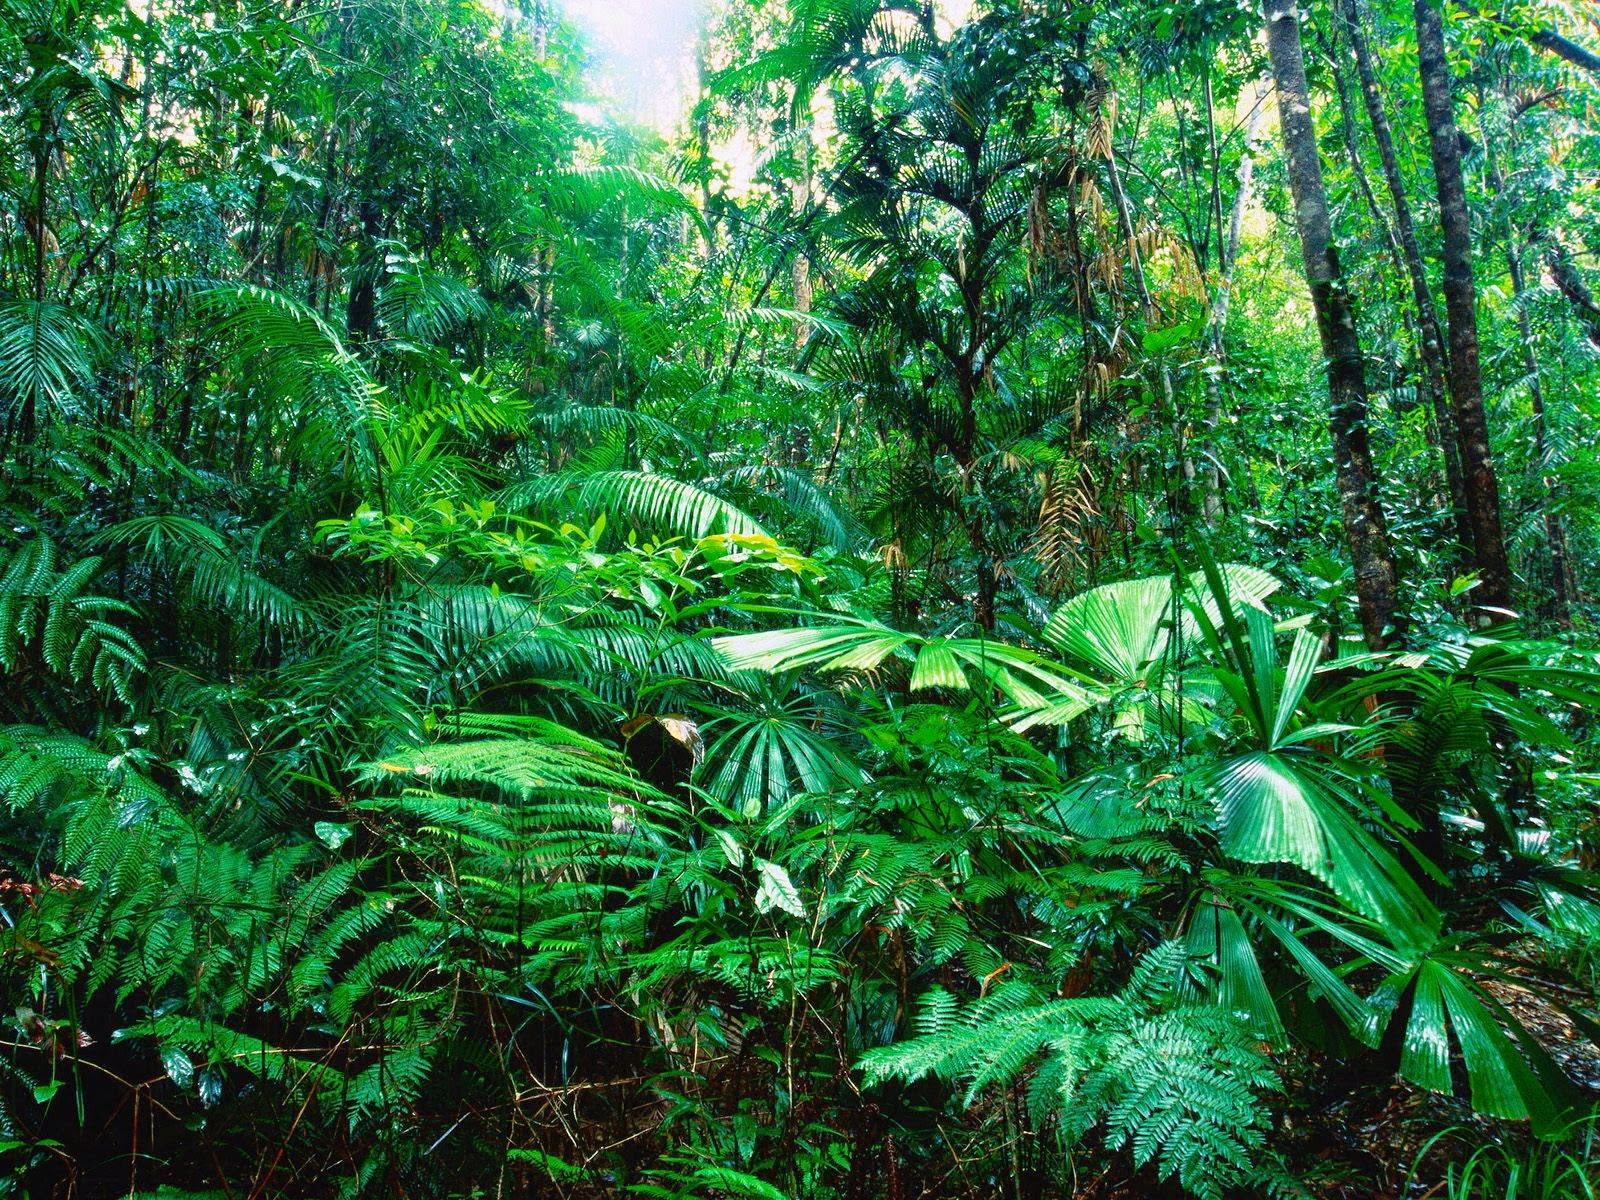 2015 03 22 for Plantas de interior altas